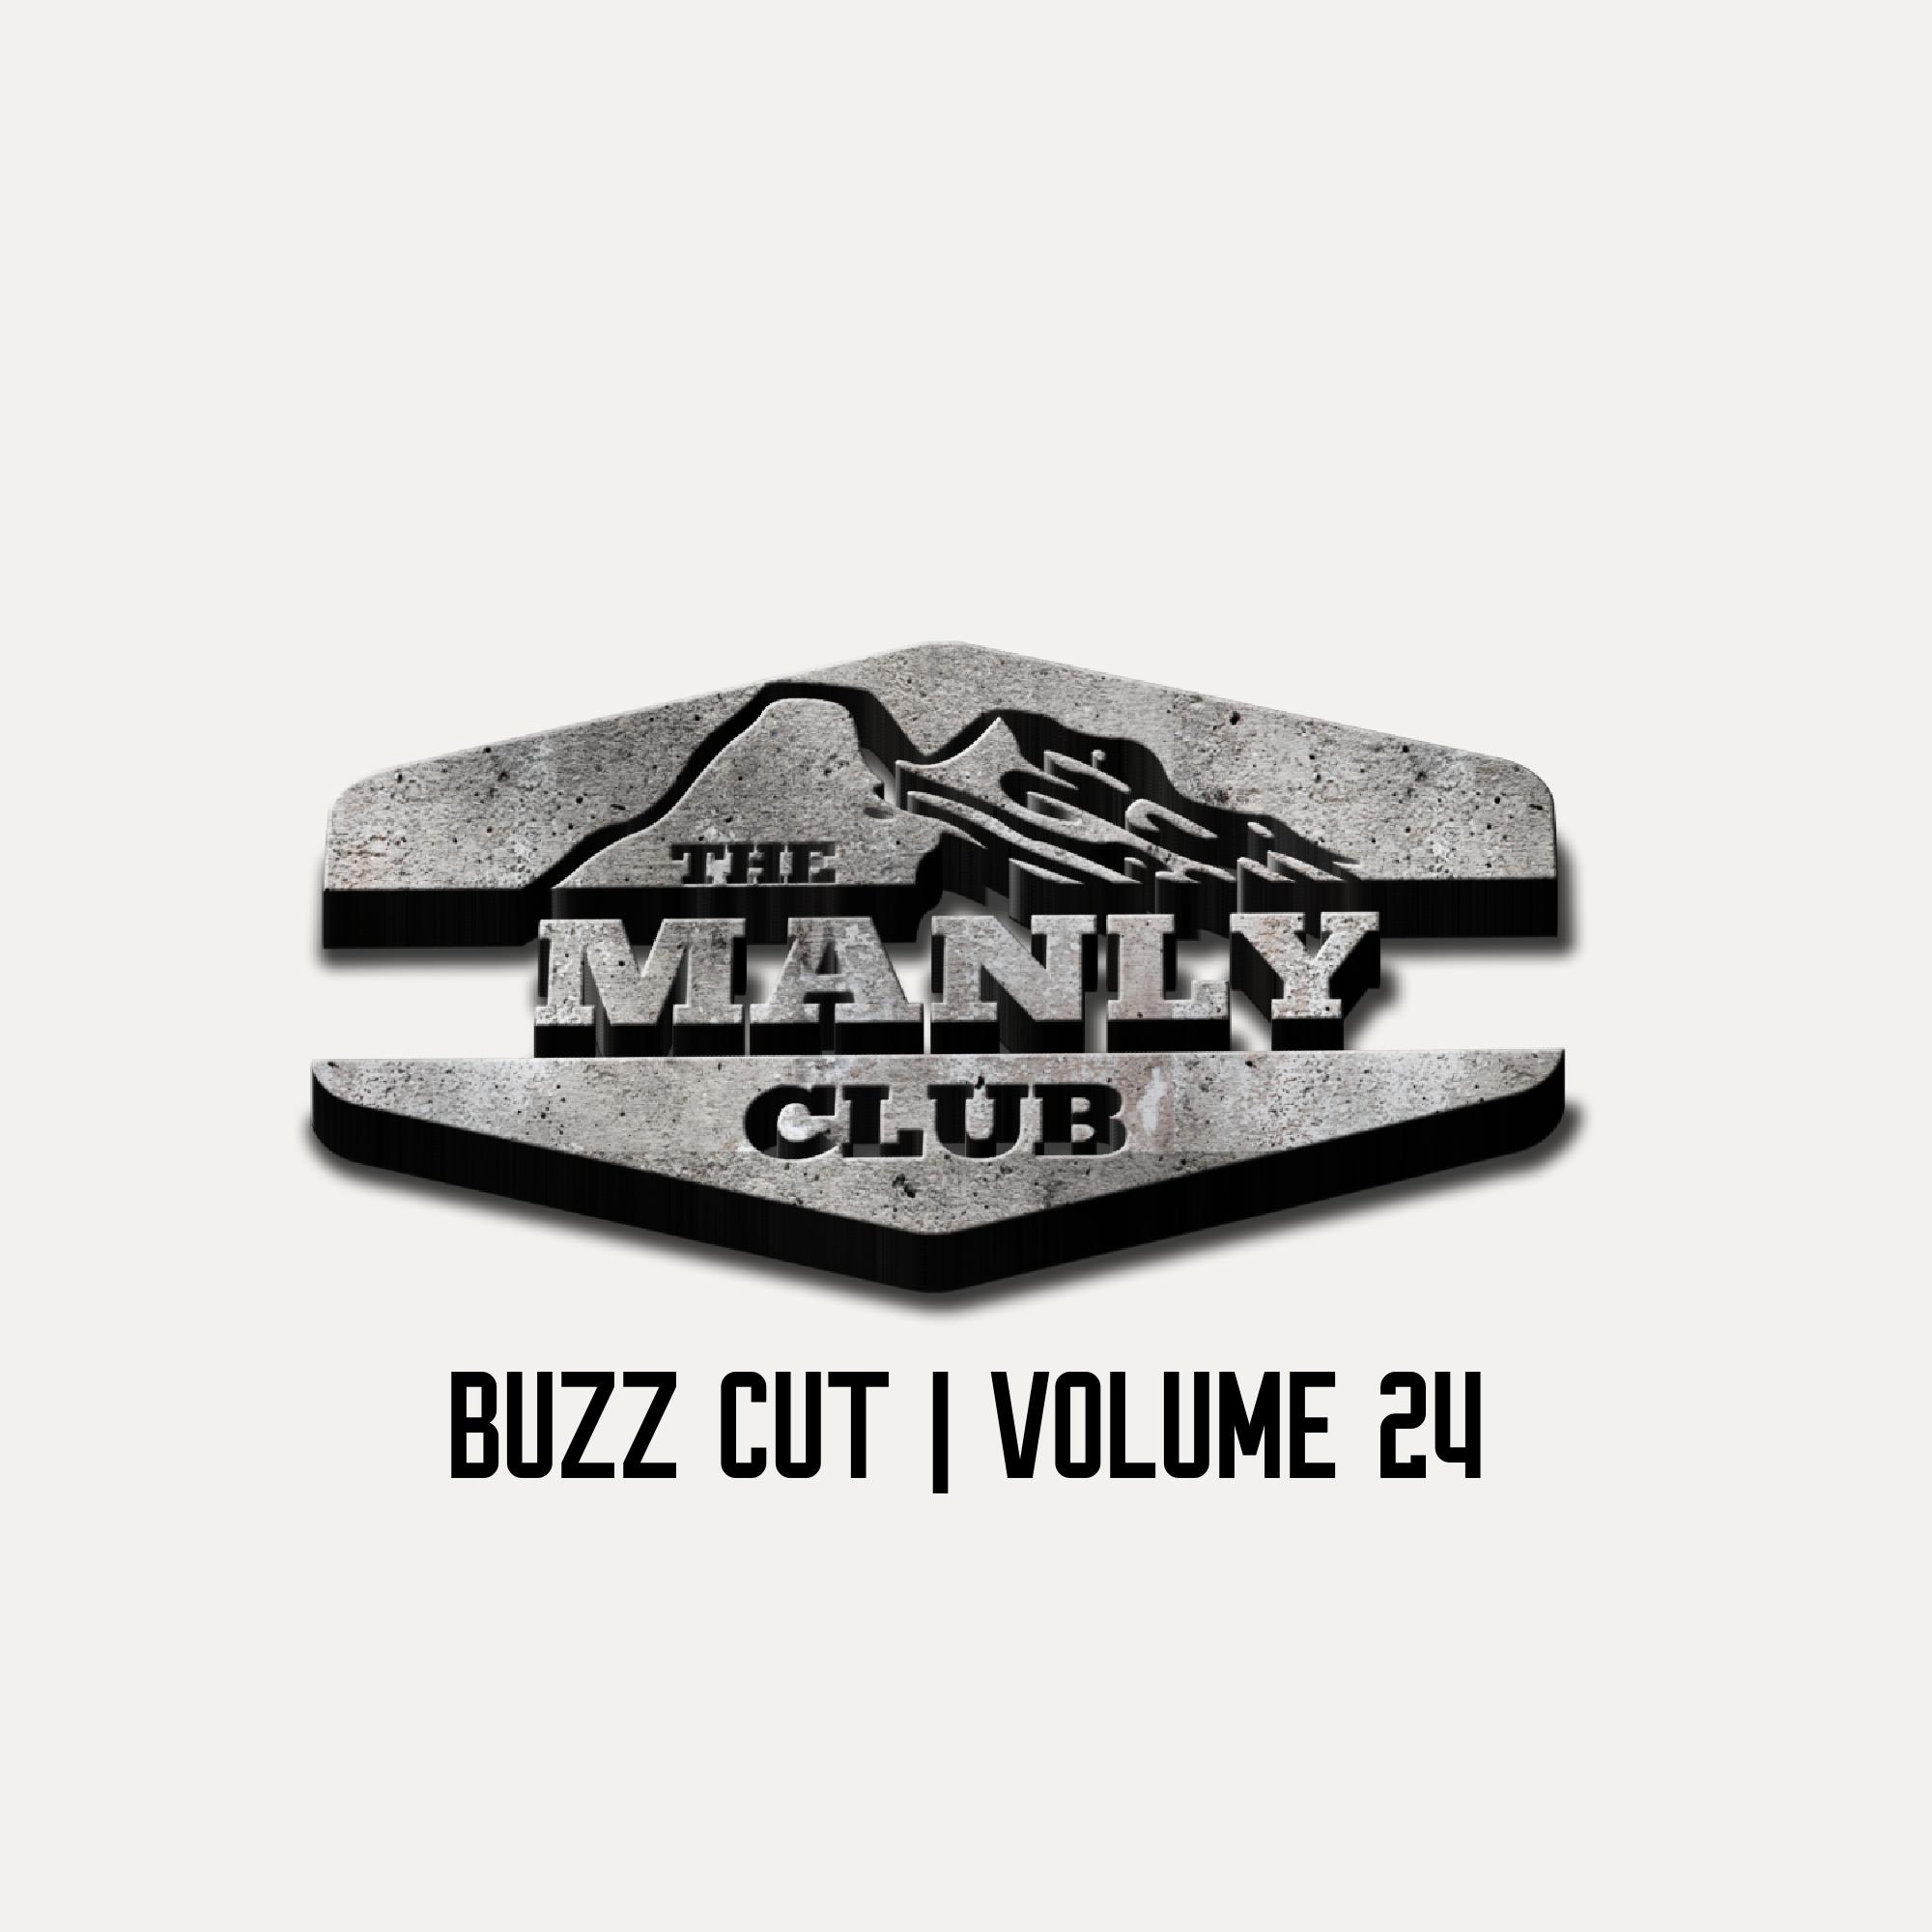 the manly club buzz cut volume 24